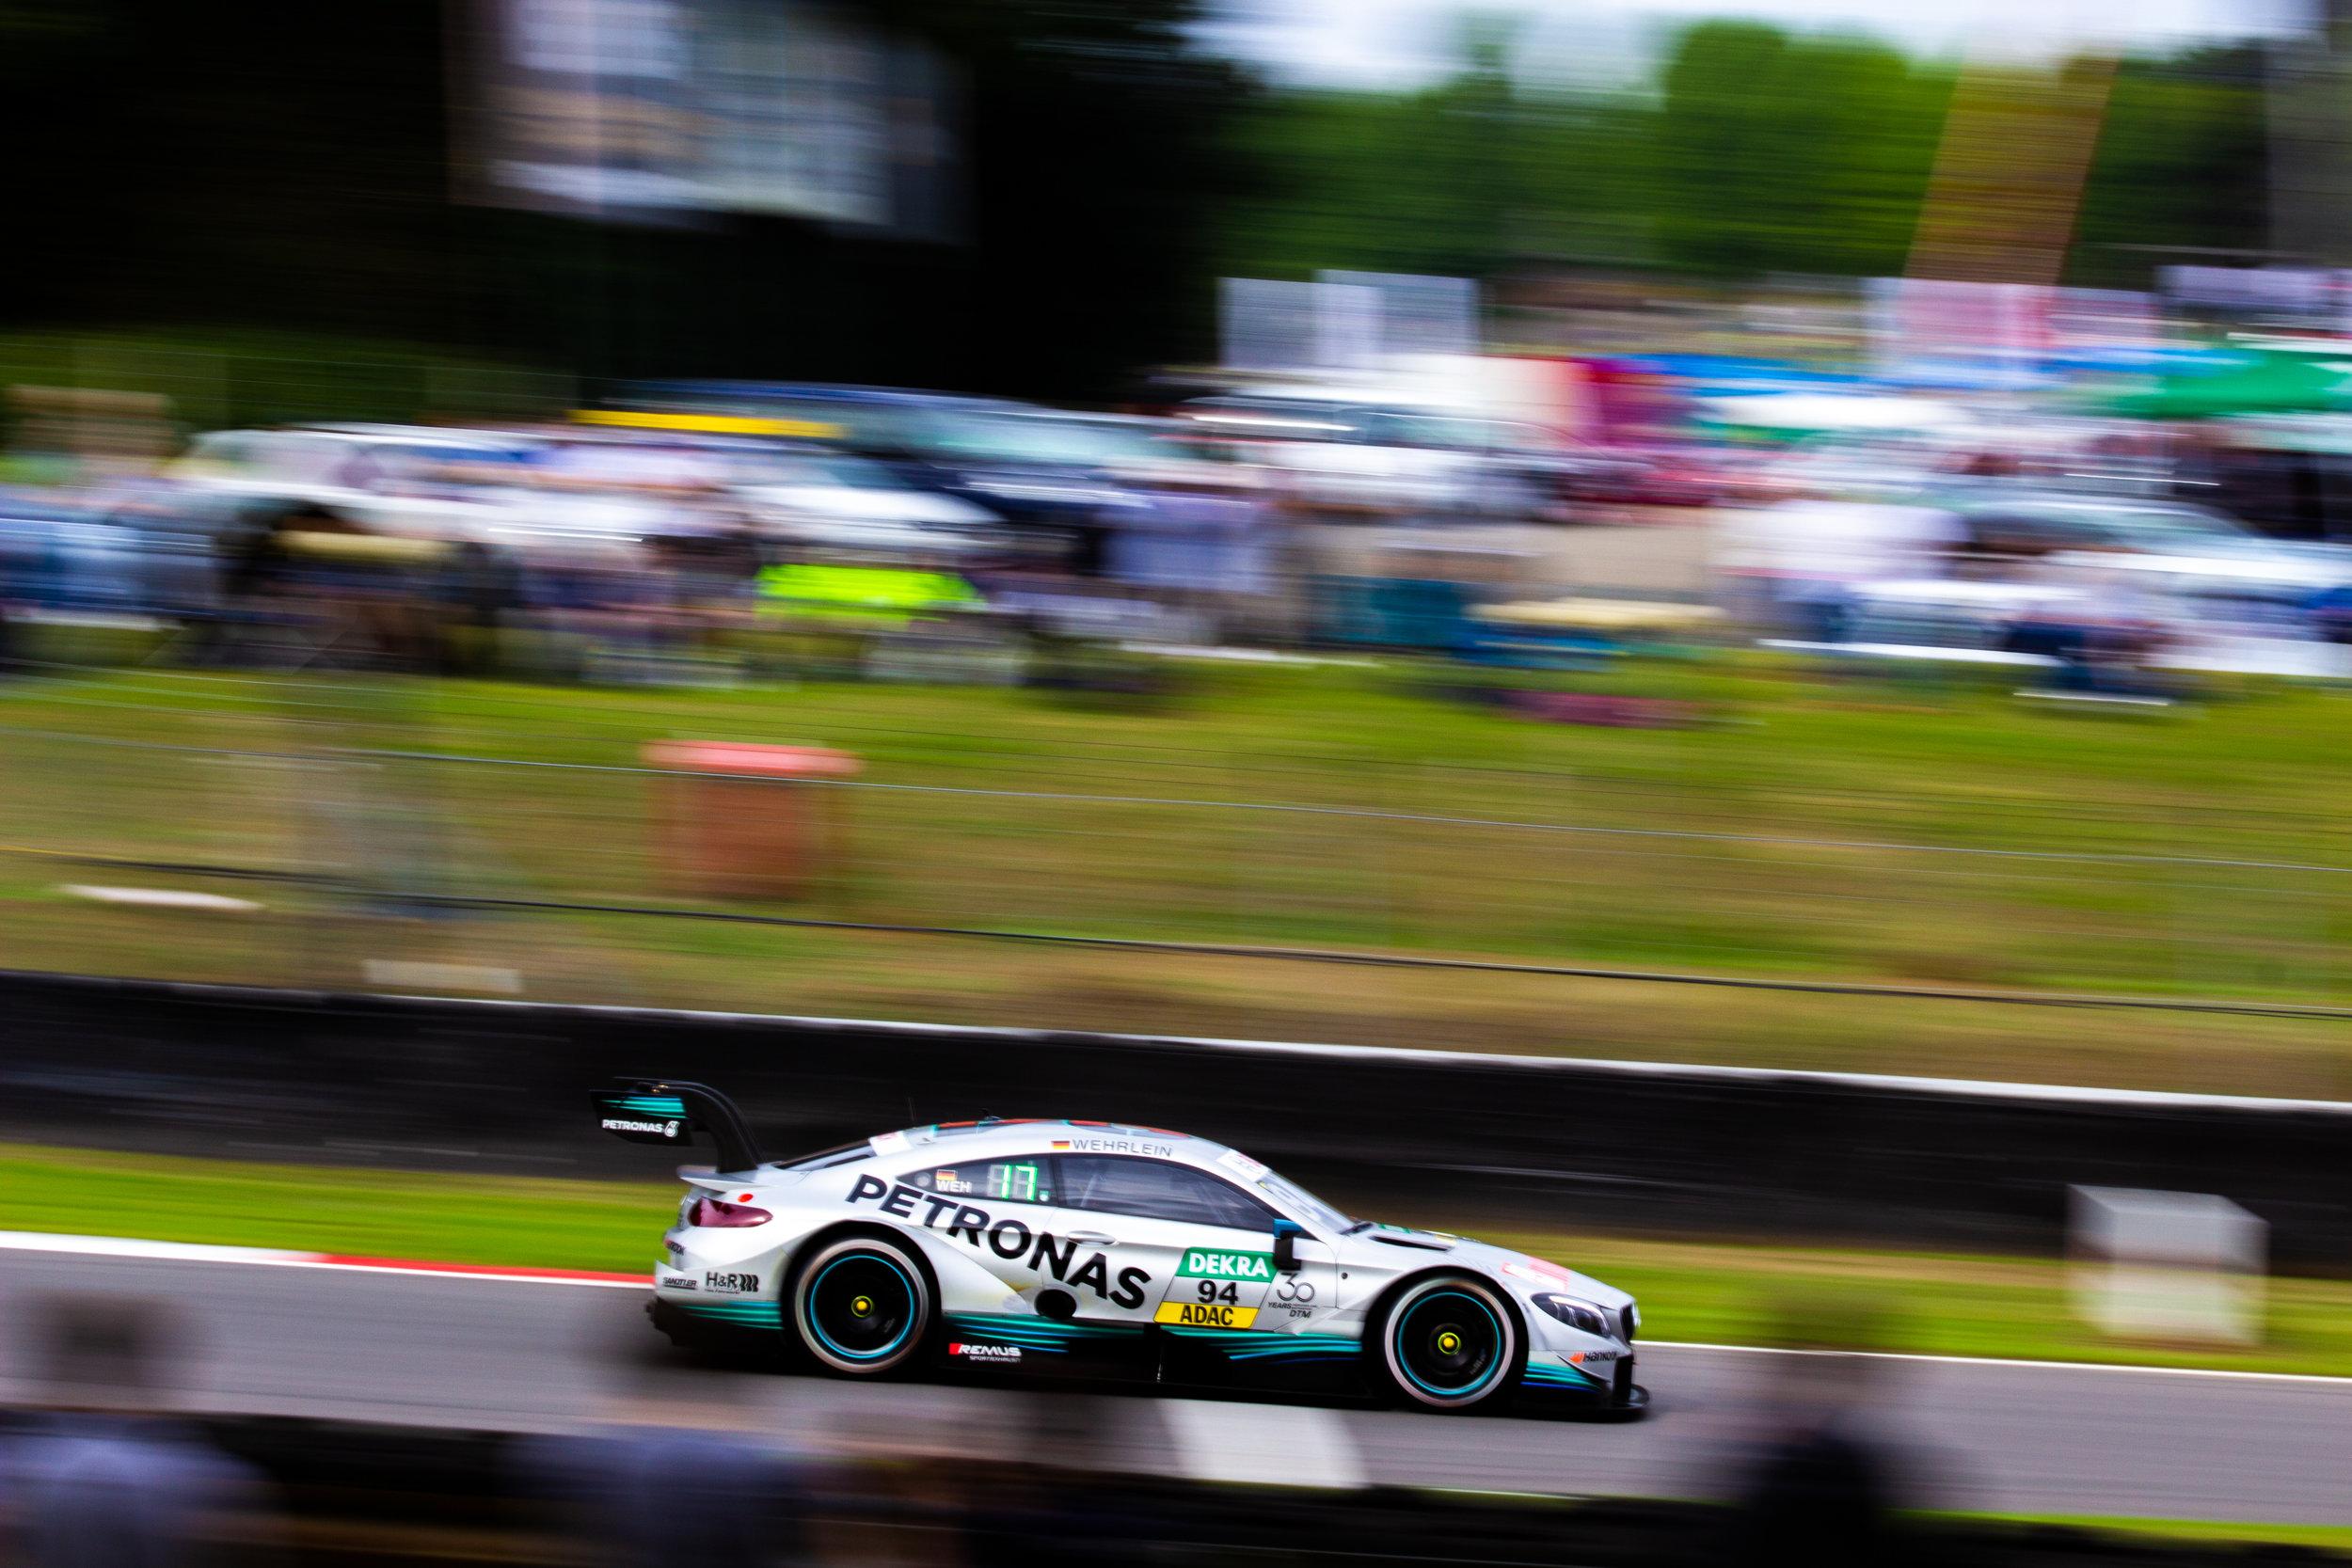 Deutsche Tourenwagen Masters - Brands Hatch